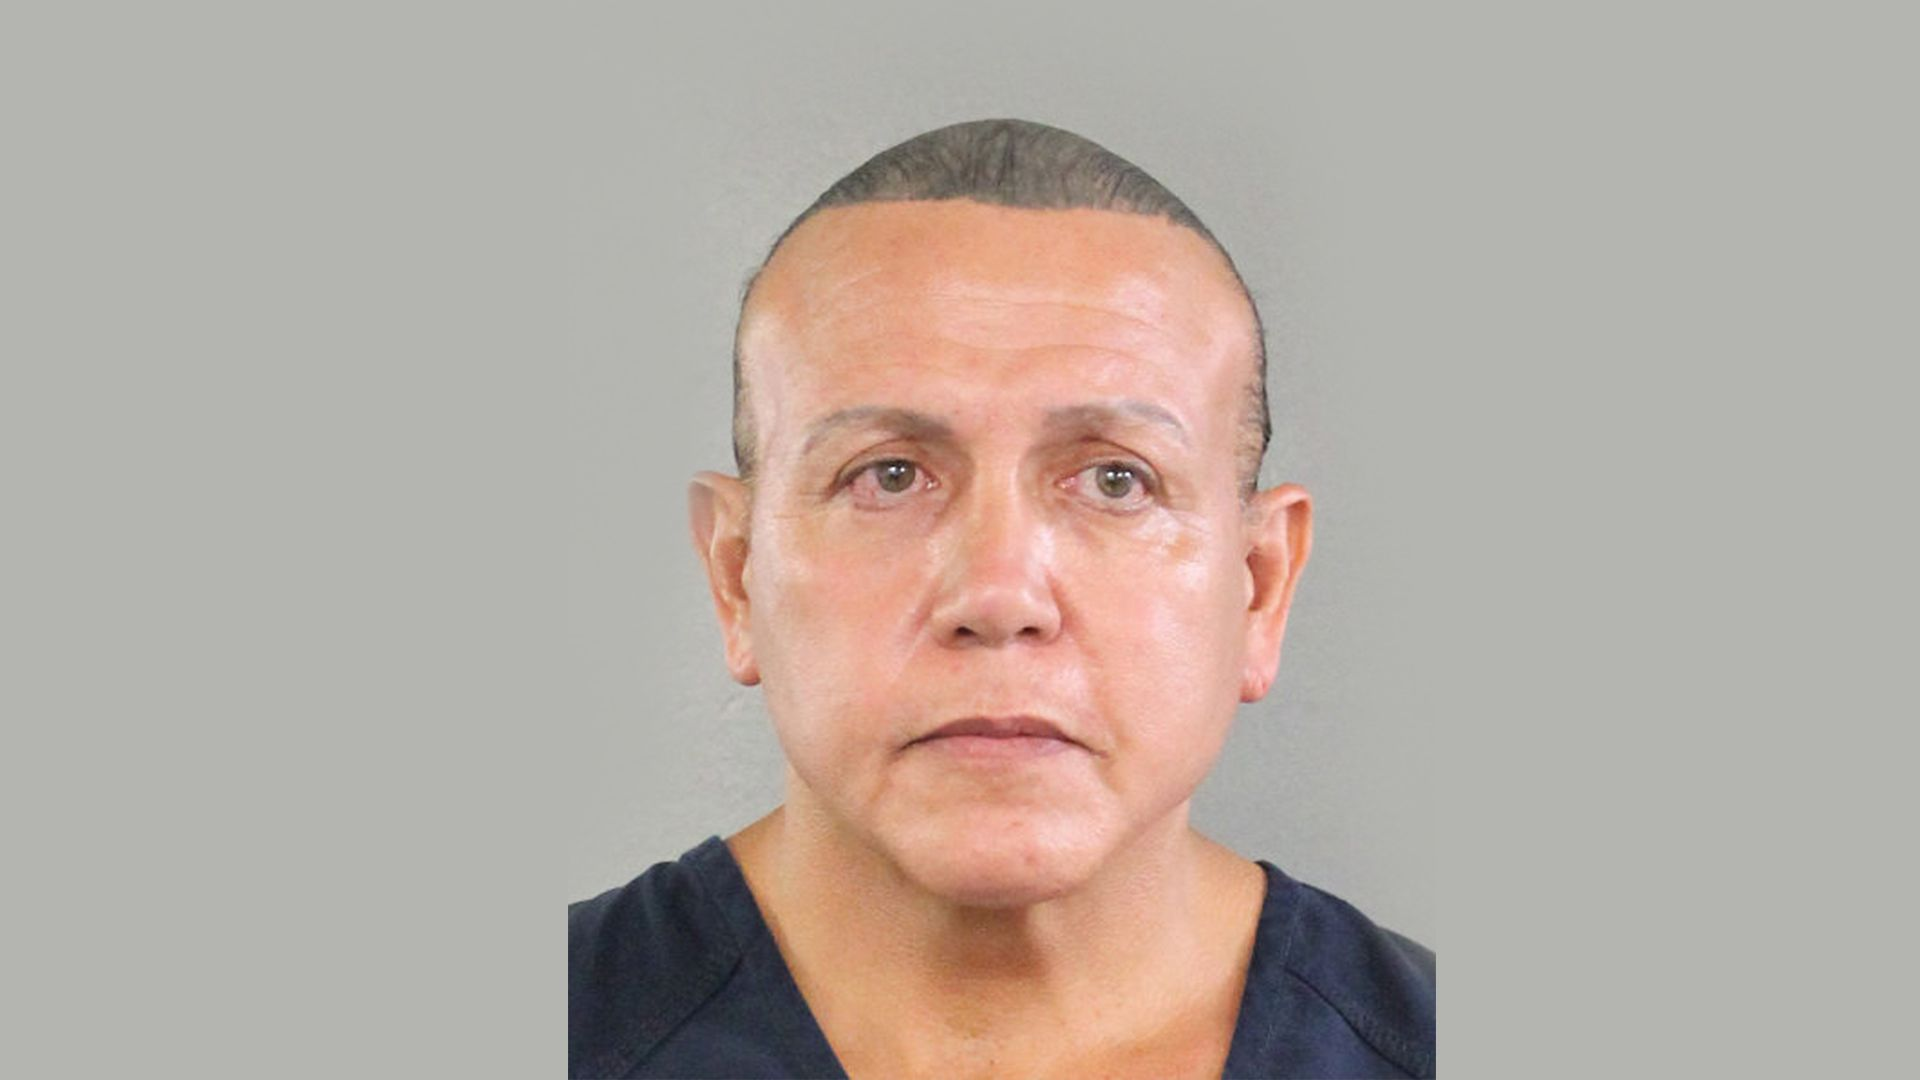 Mugshot of bomb suspect Cesar Sayoc